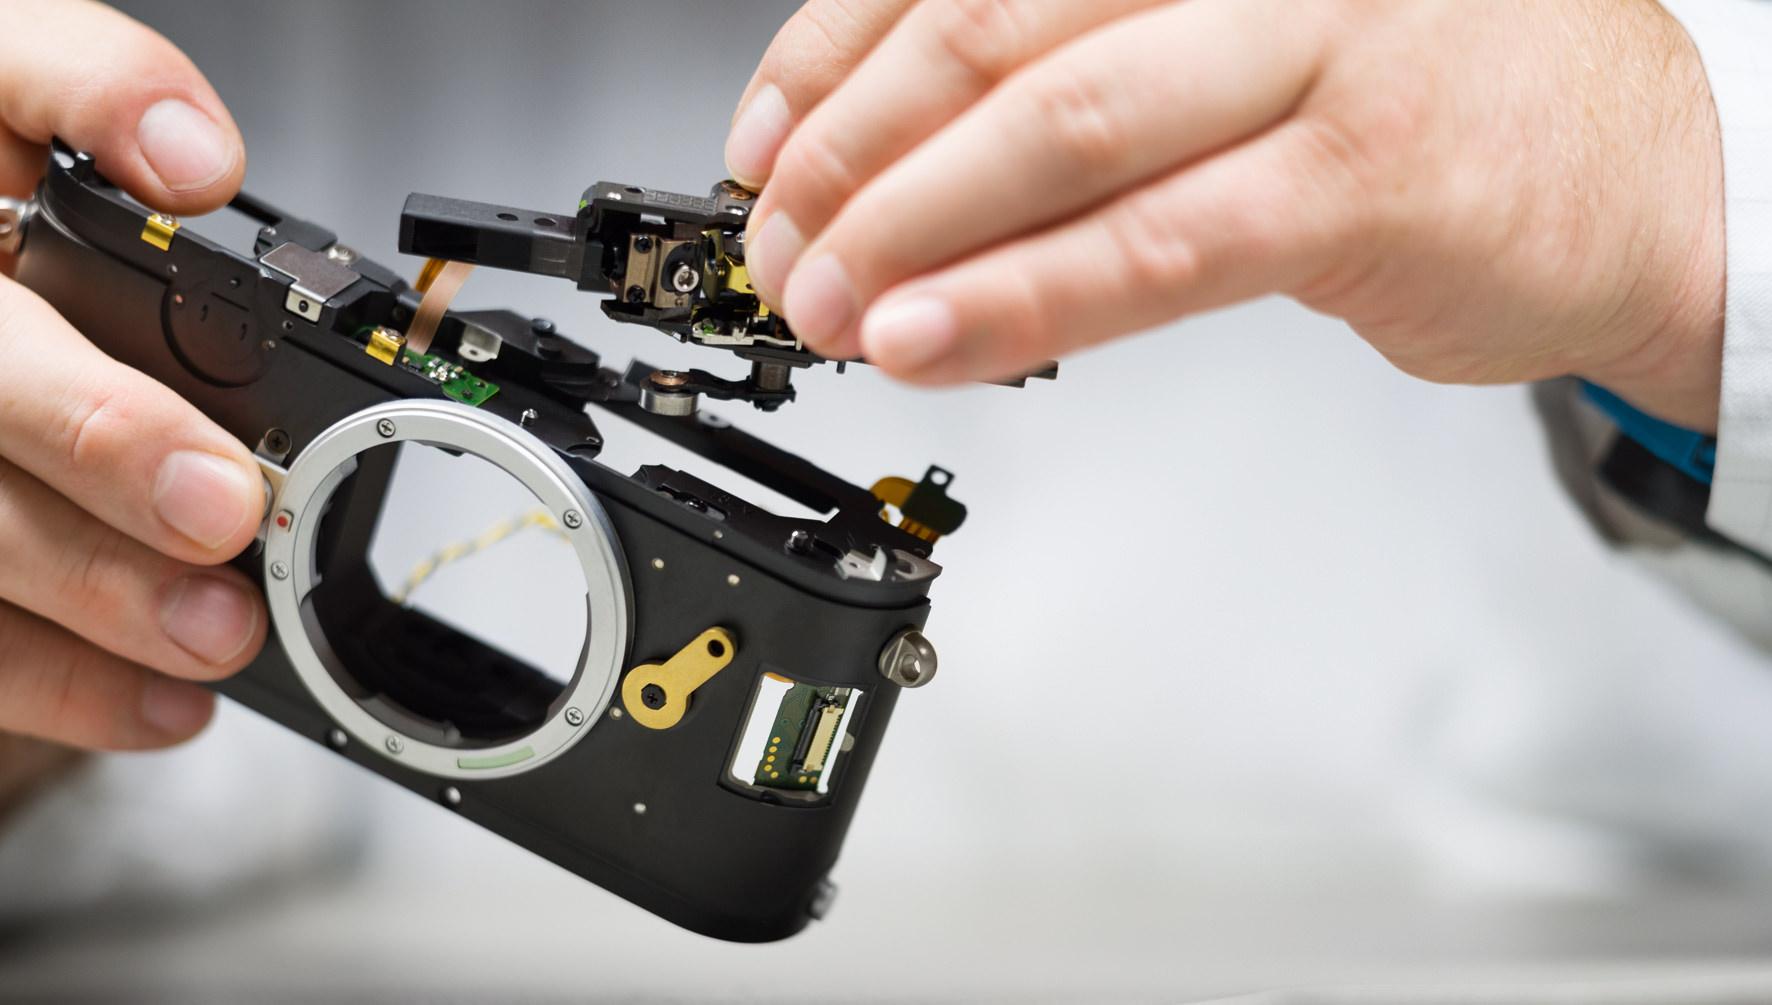 Leica M10 Slim Digital Rangefinder Announced